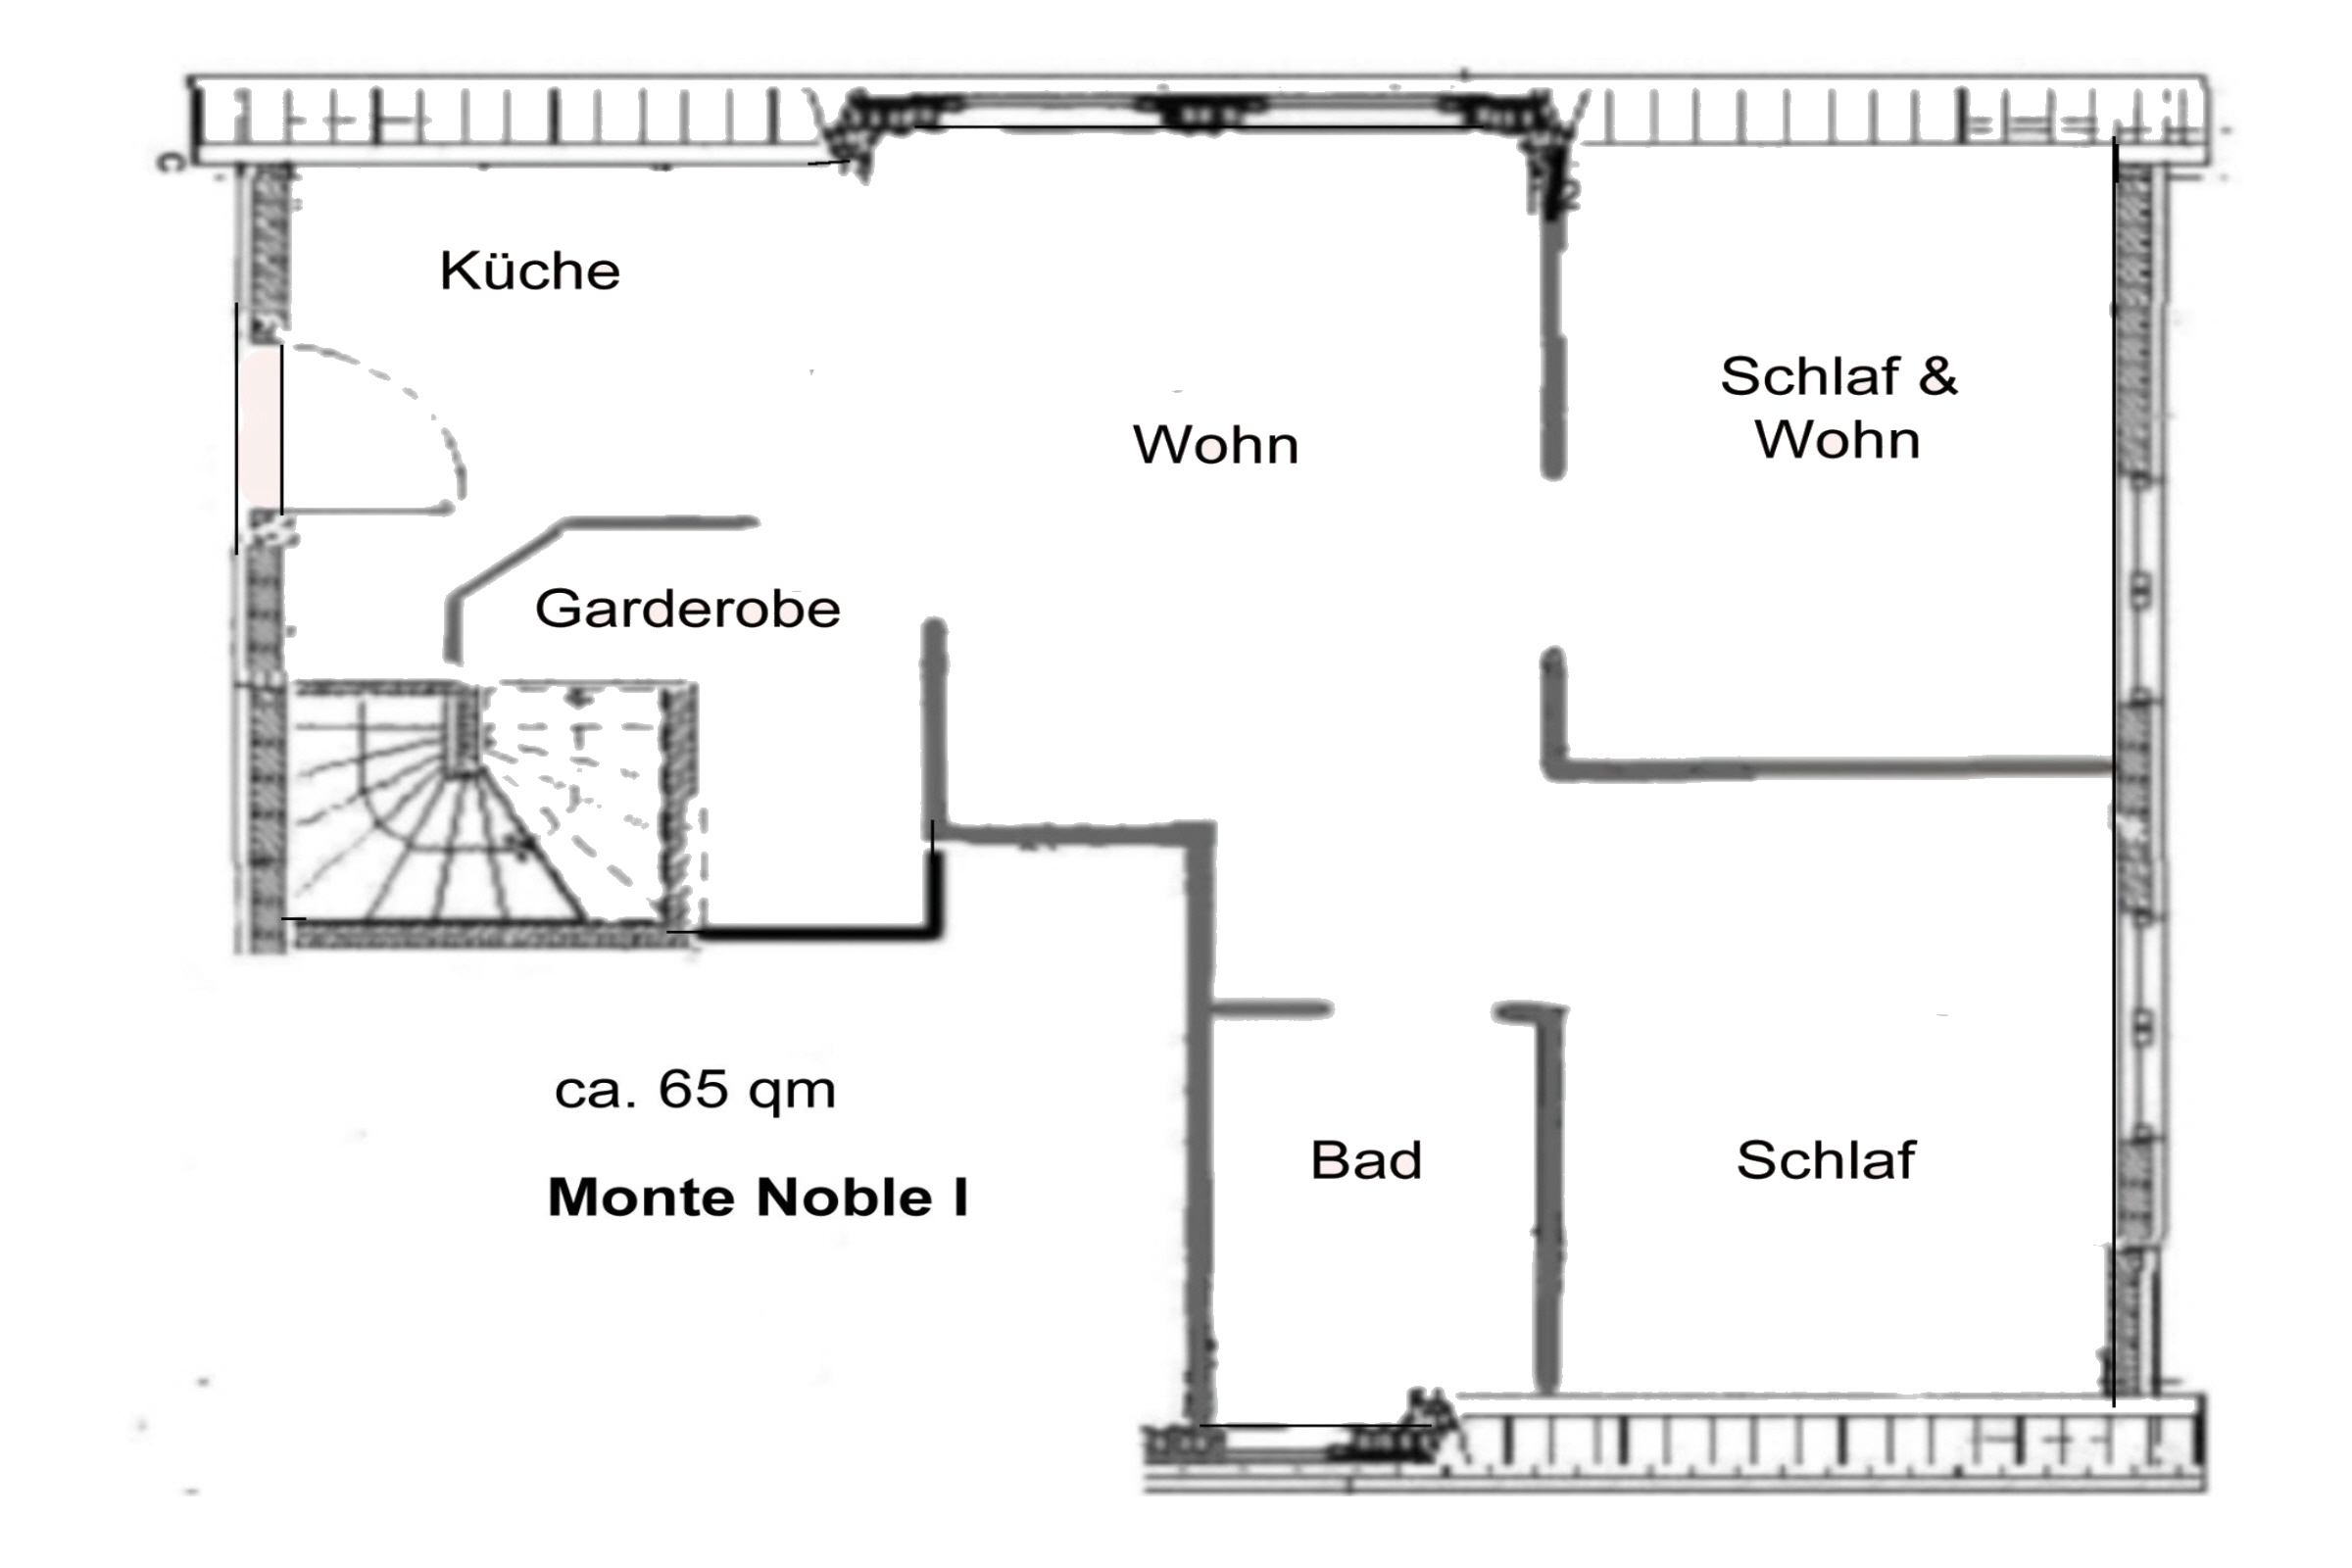 Monte-Noble-I